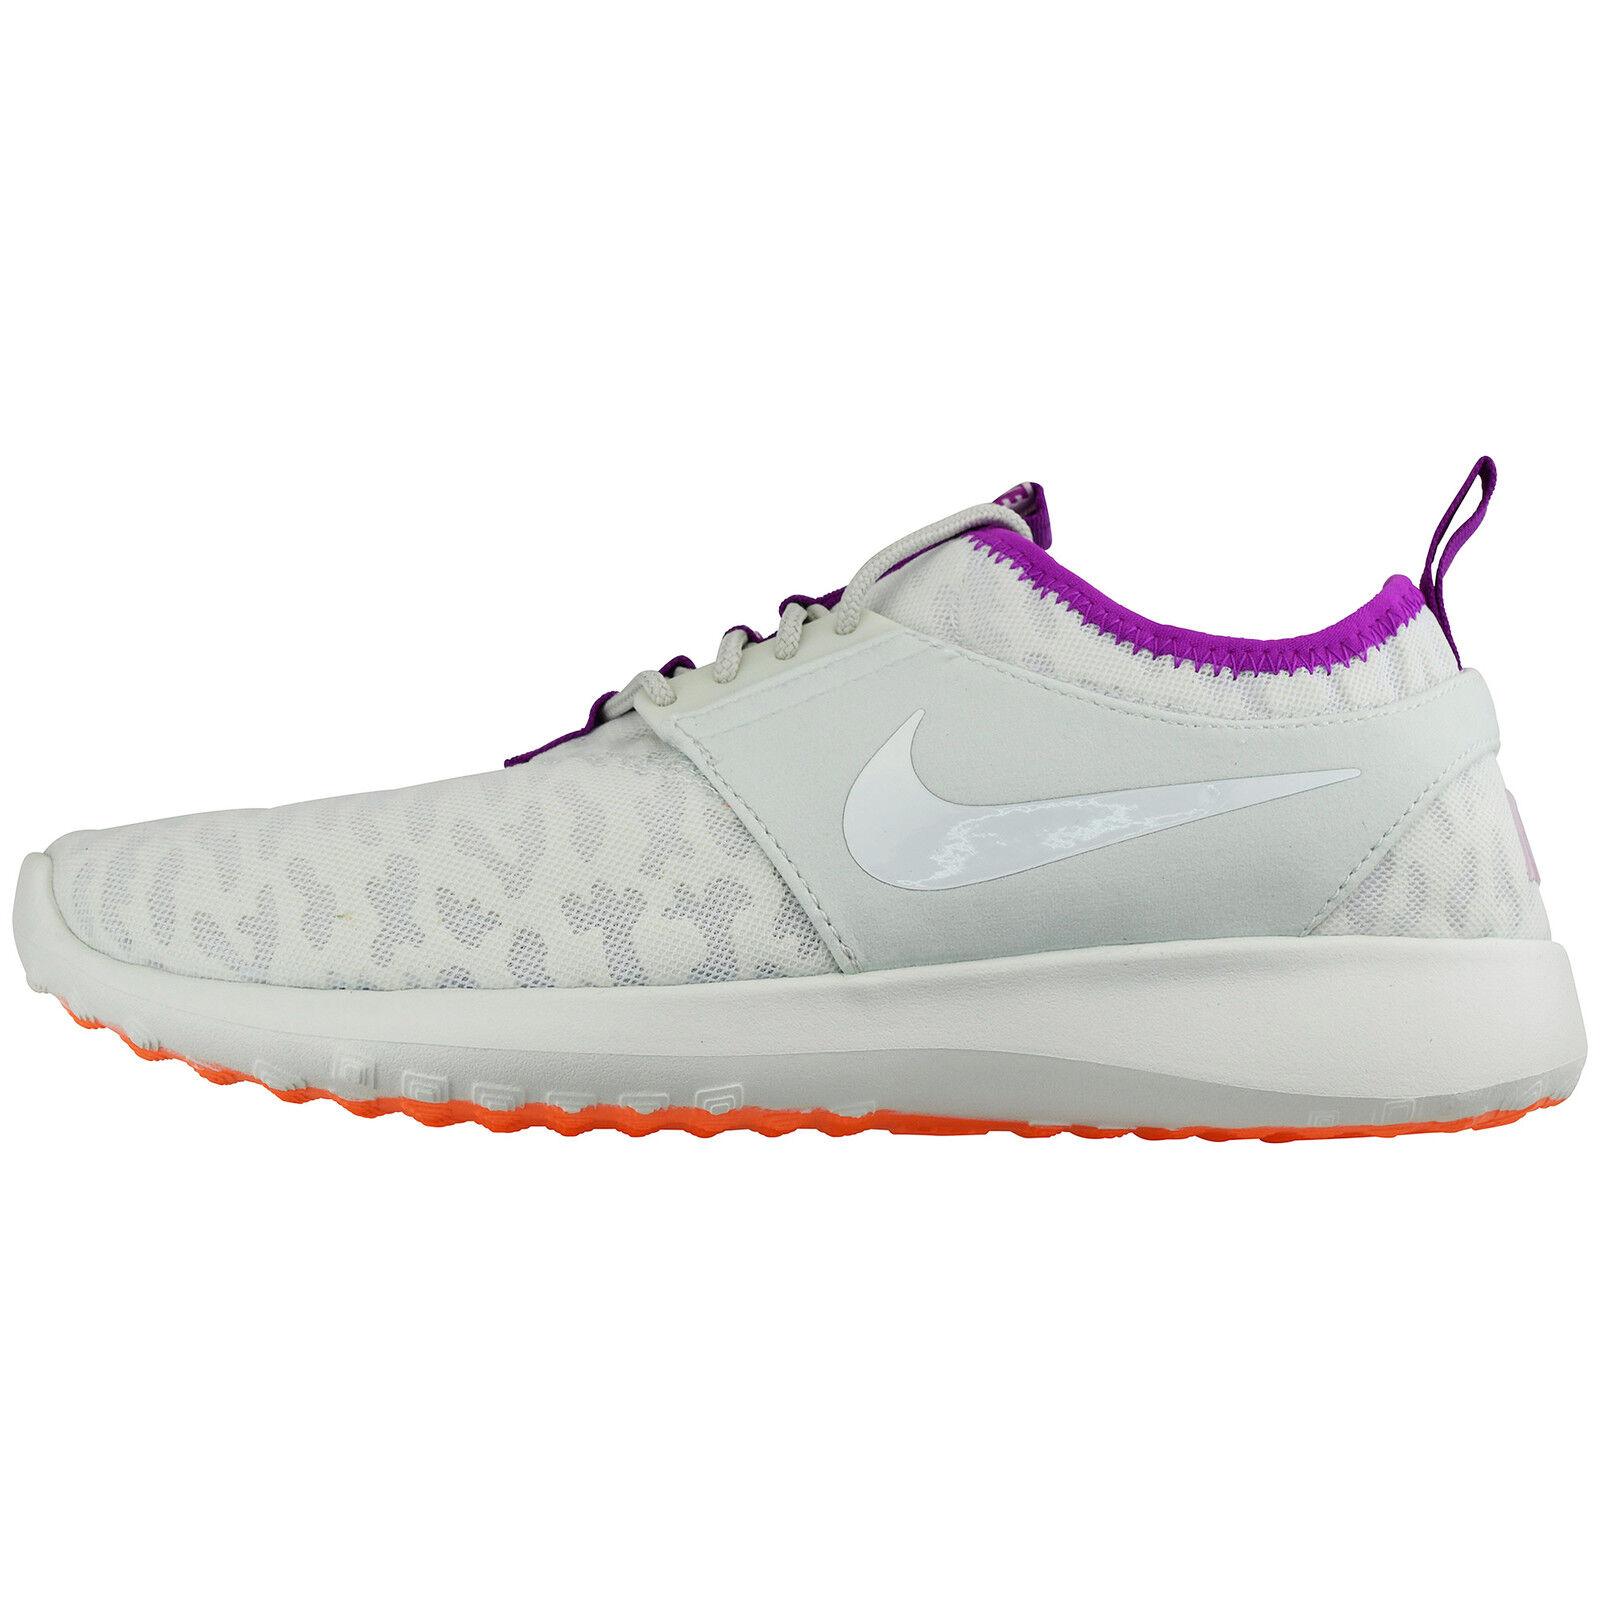 WMNS Nike Juvenate PRM 844973-101 Lifestyle Laufschuhe Running Freizeit Sneaker